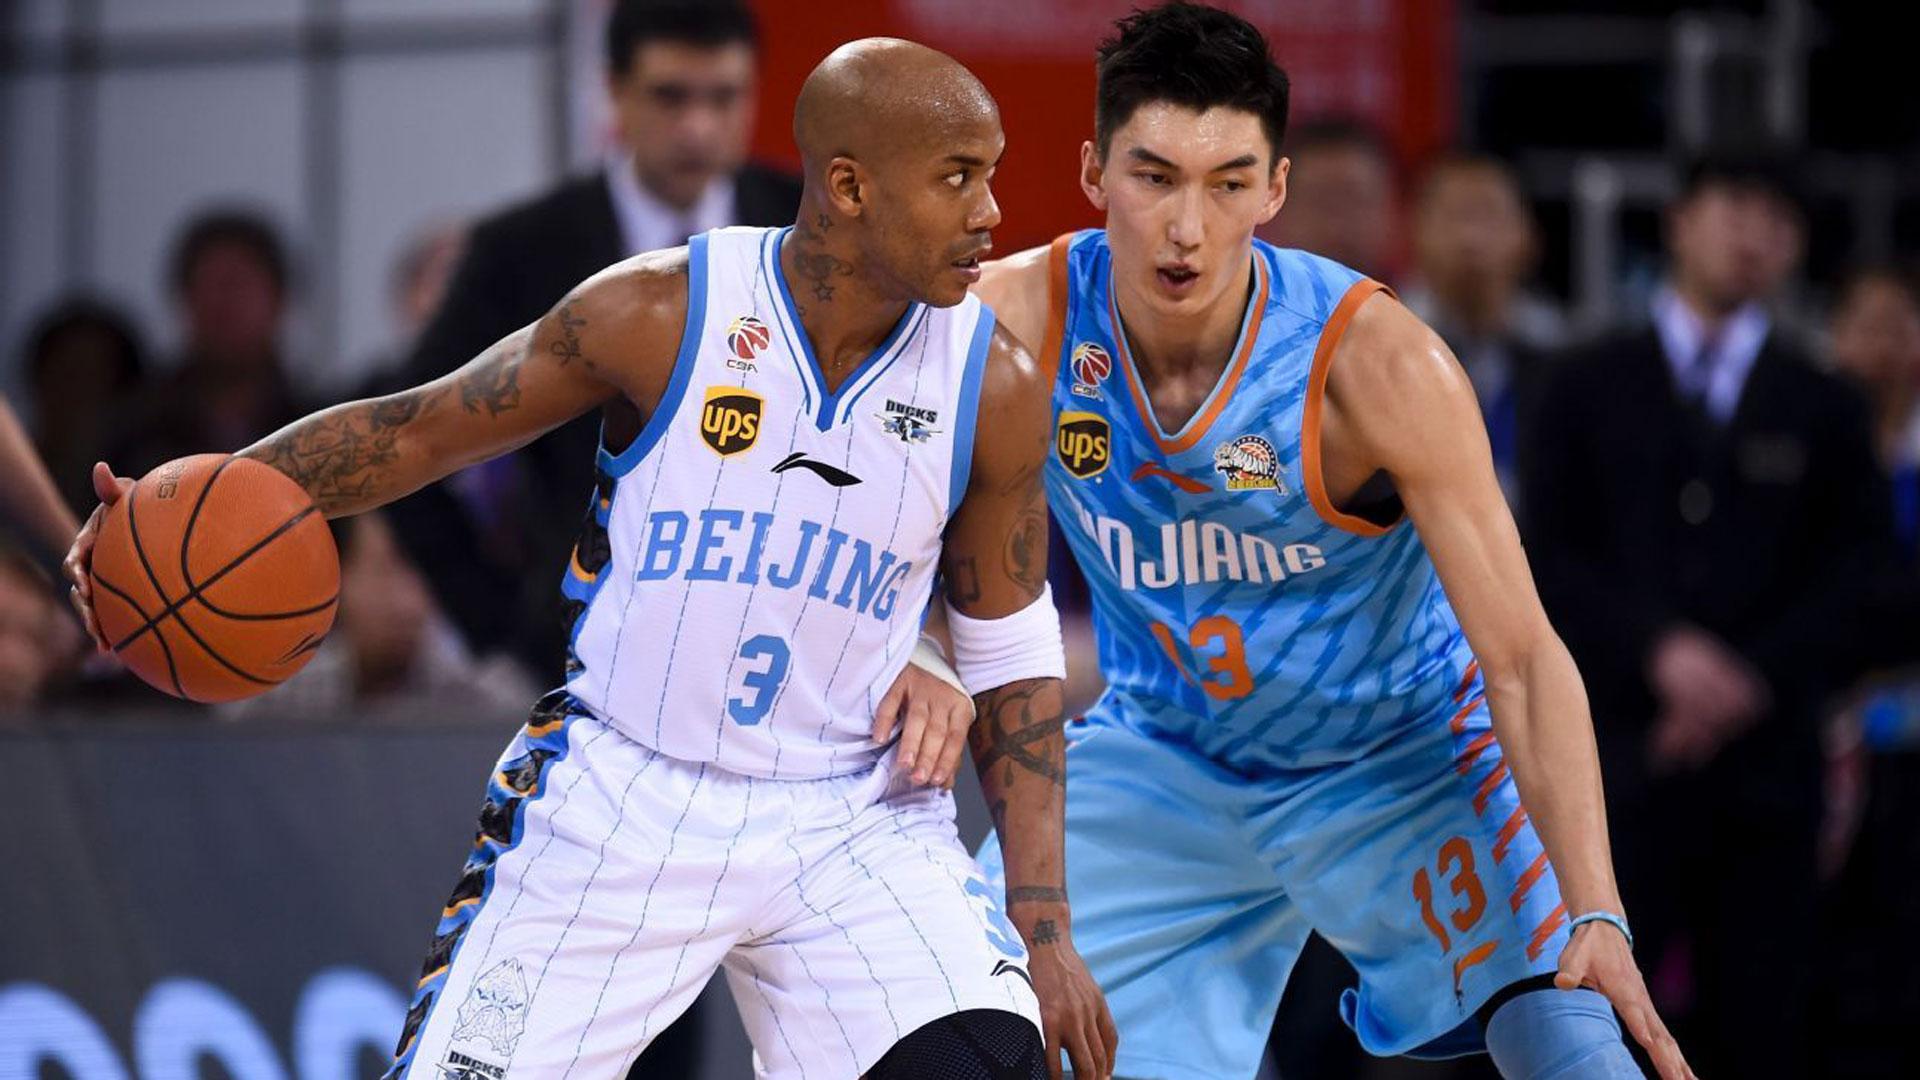 Stephon Marbury China Basketball League CBA